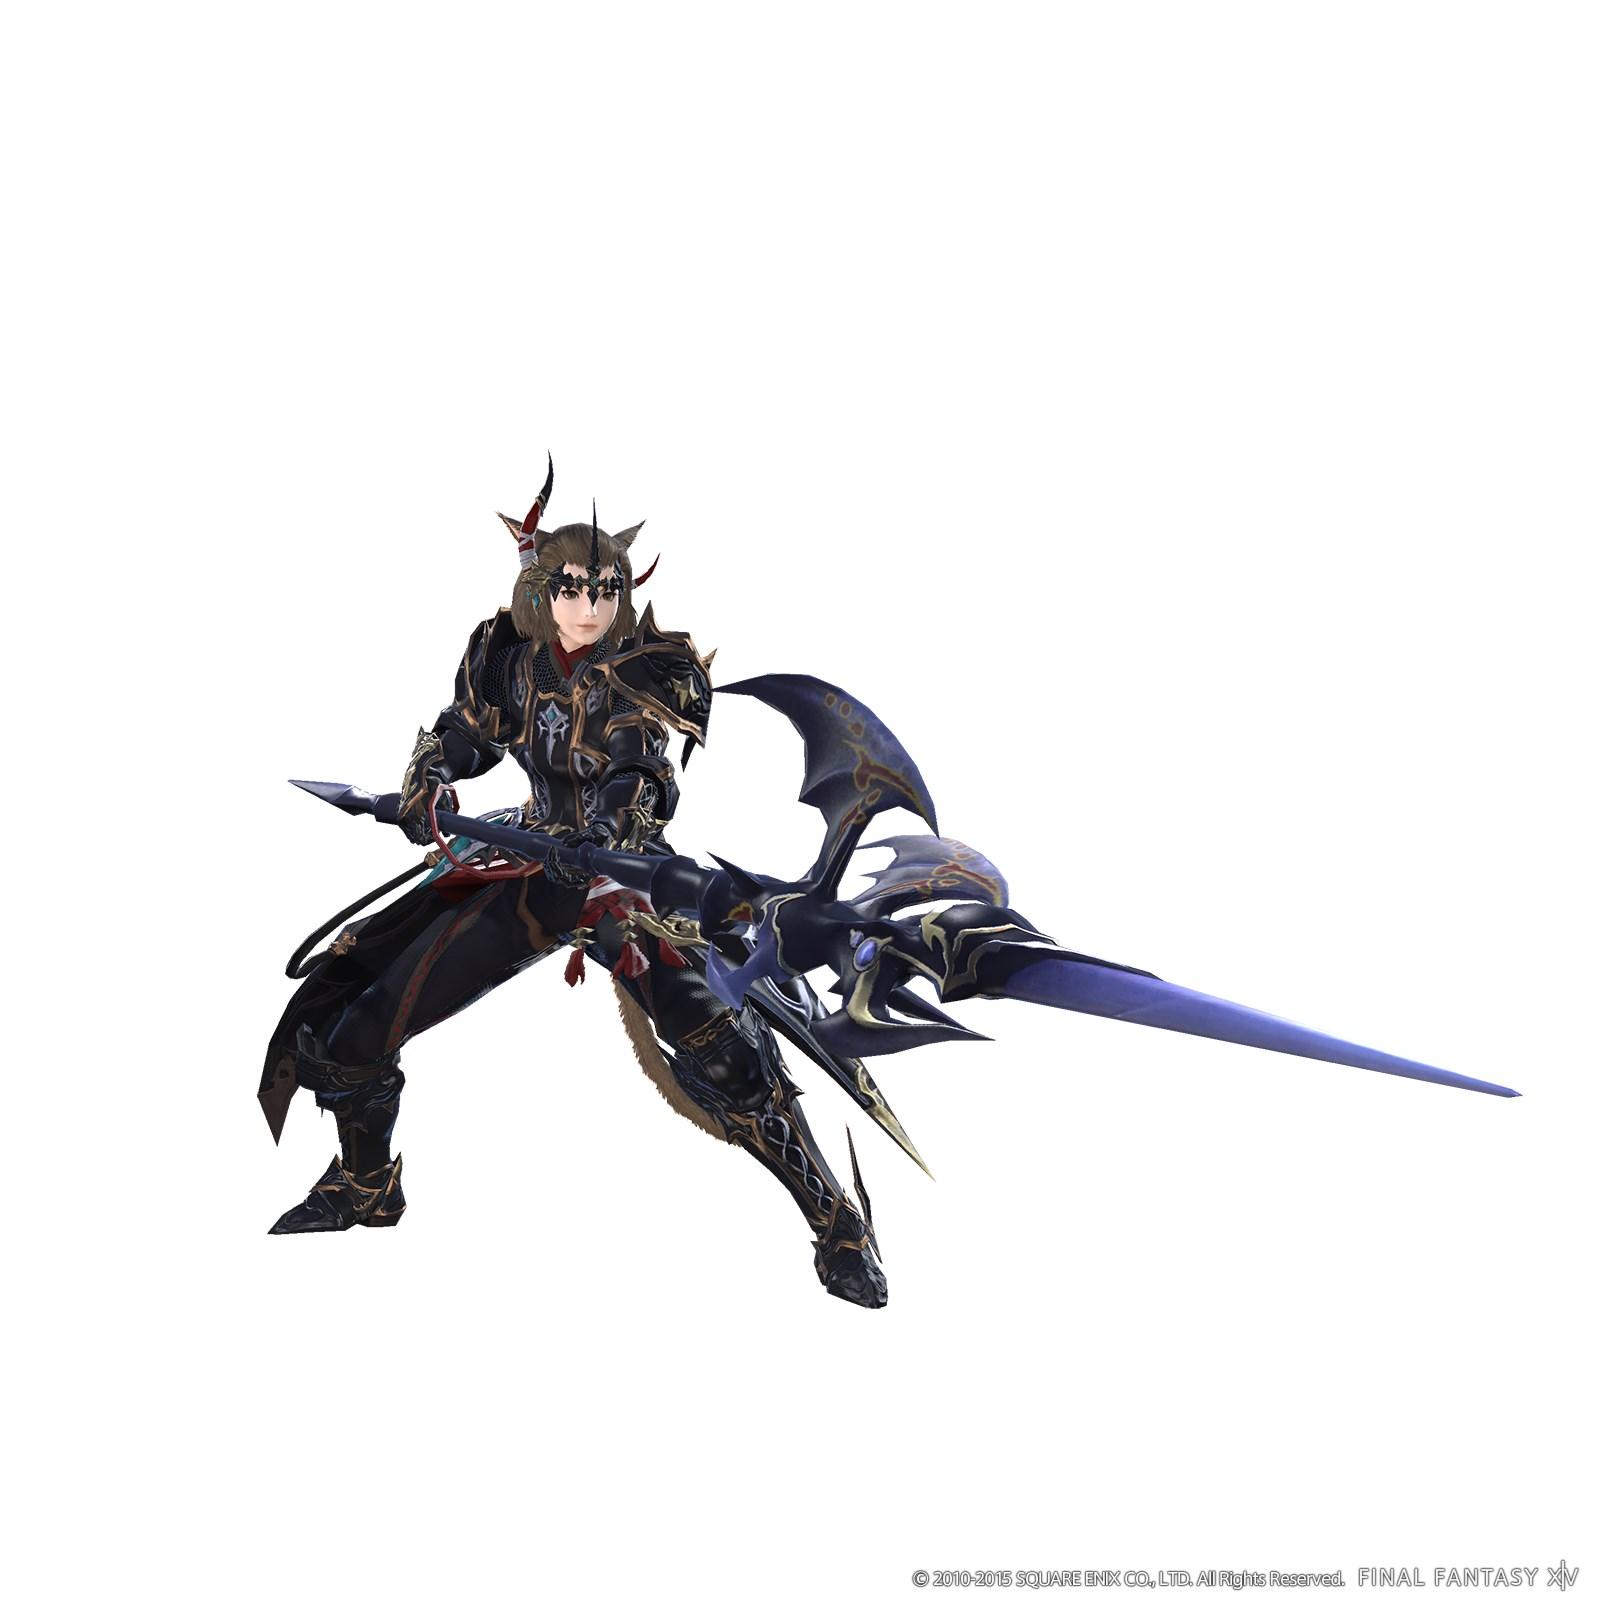 Final Fantasy XIV Gets New Screenshots Showcasing Major ...